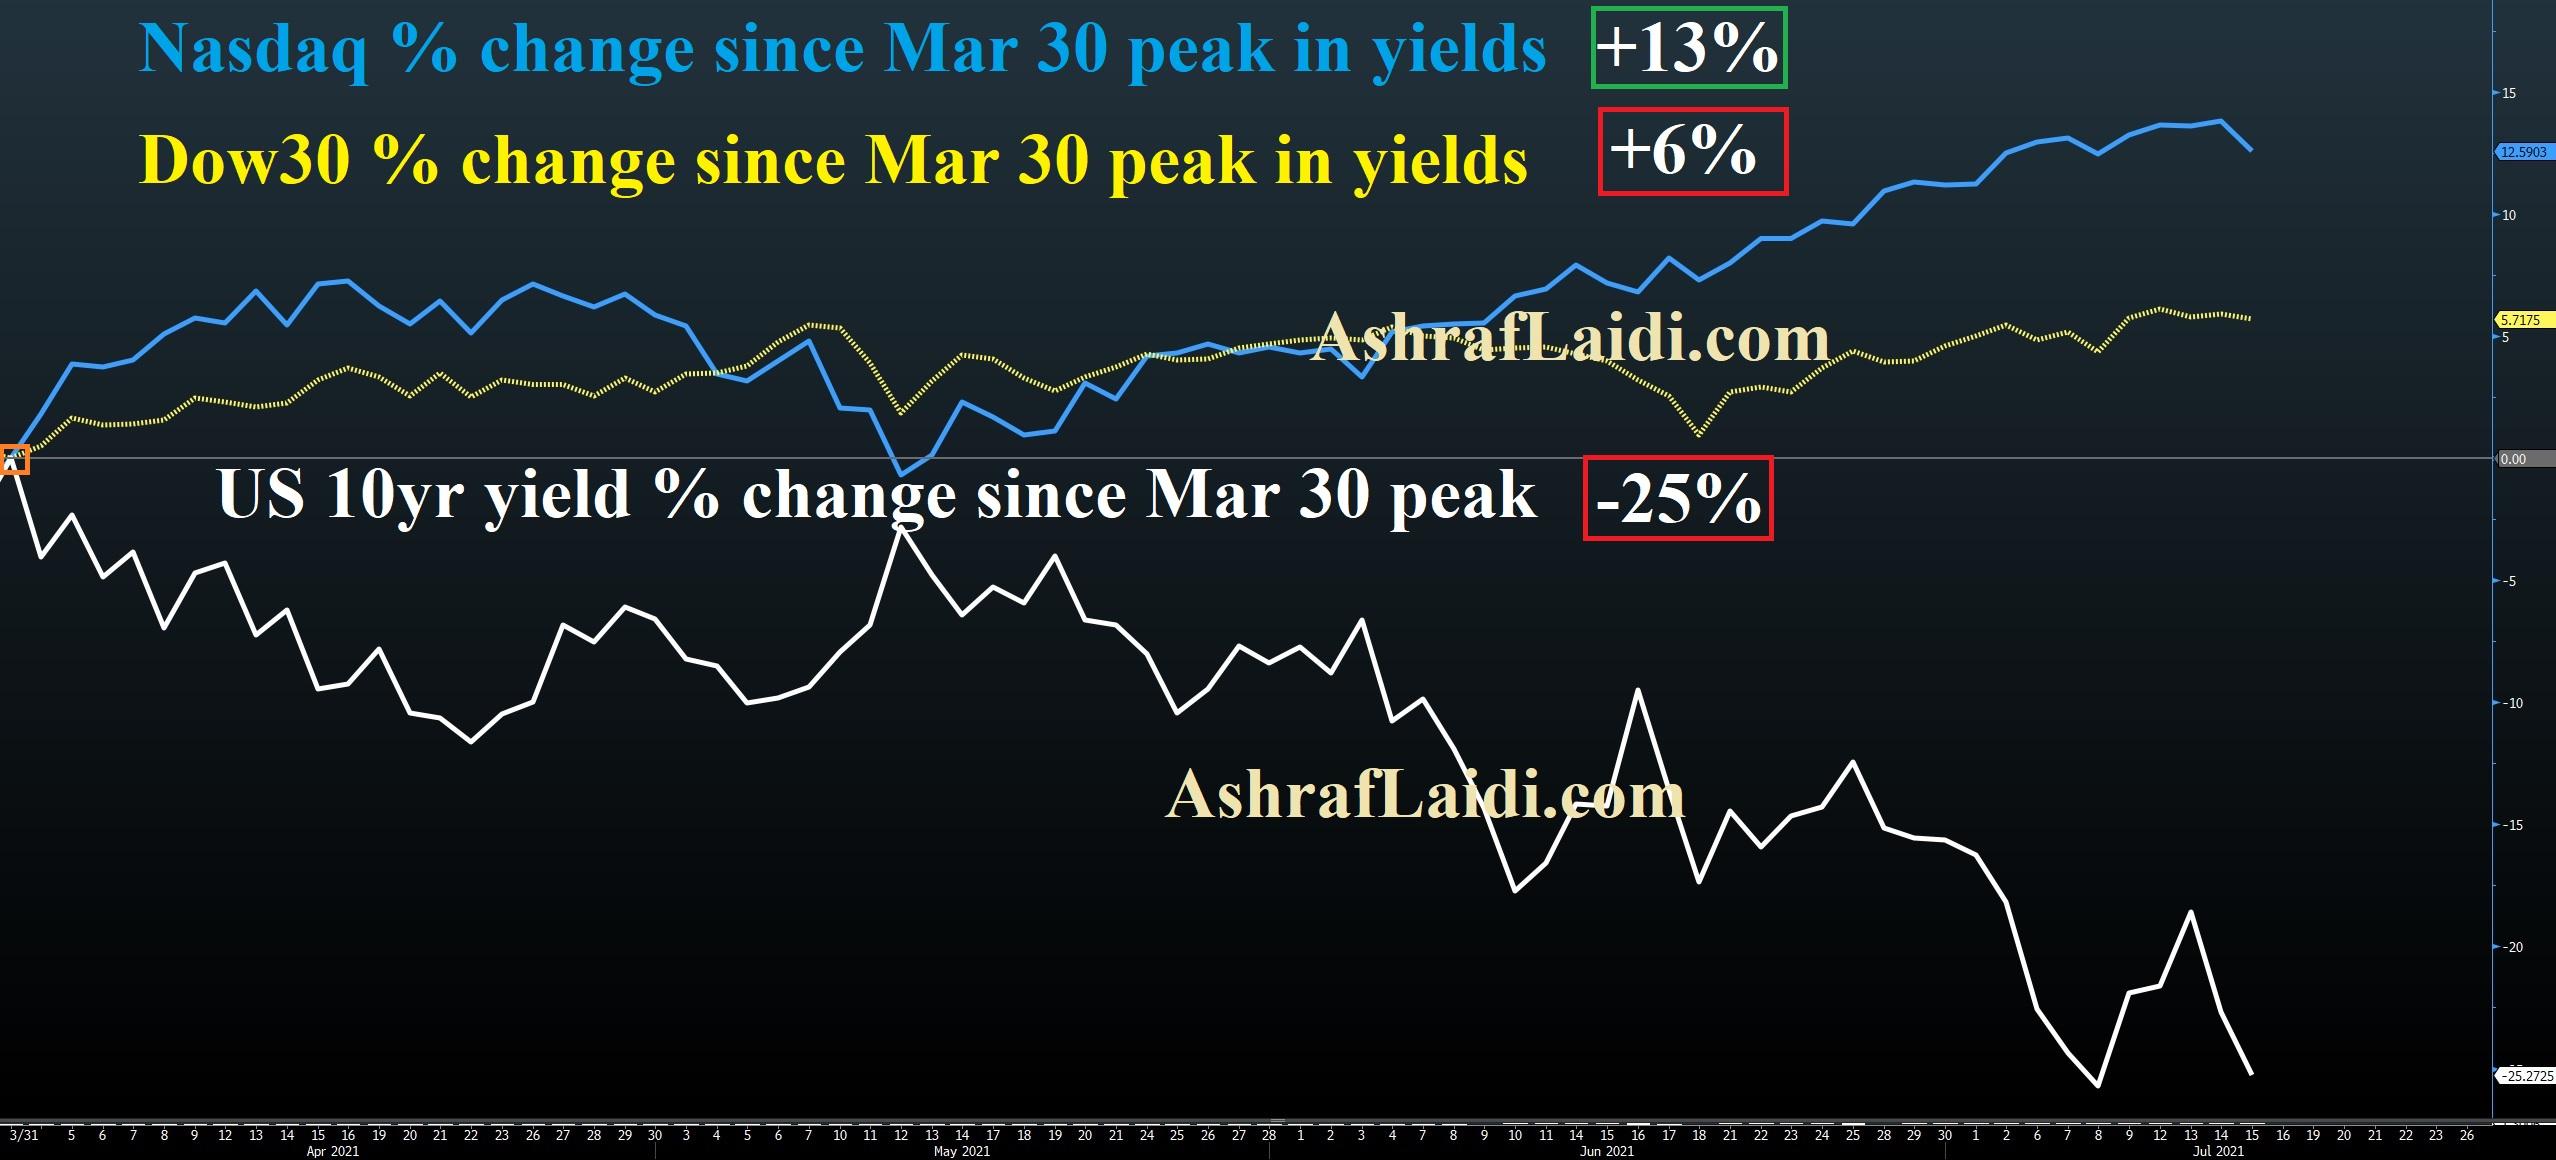 Nasdaq - Dow 30 % Change Since March 30